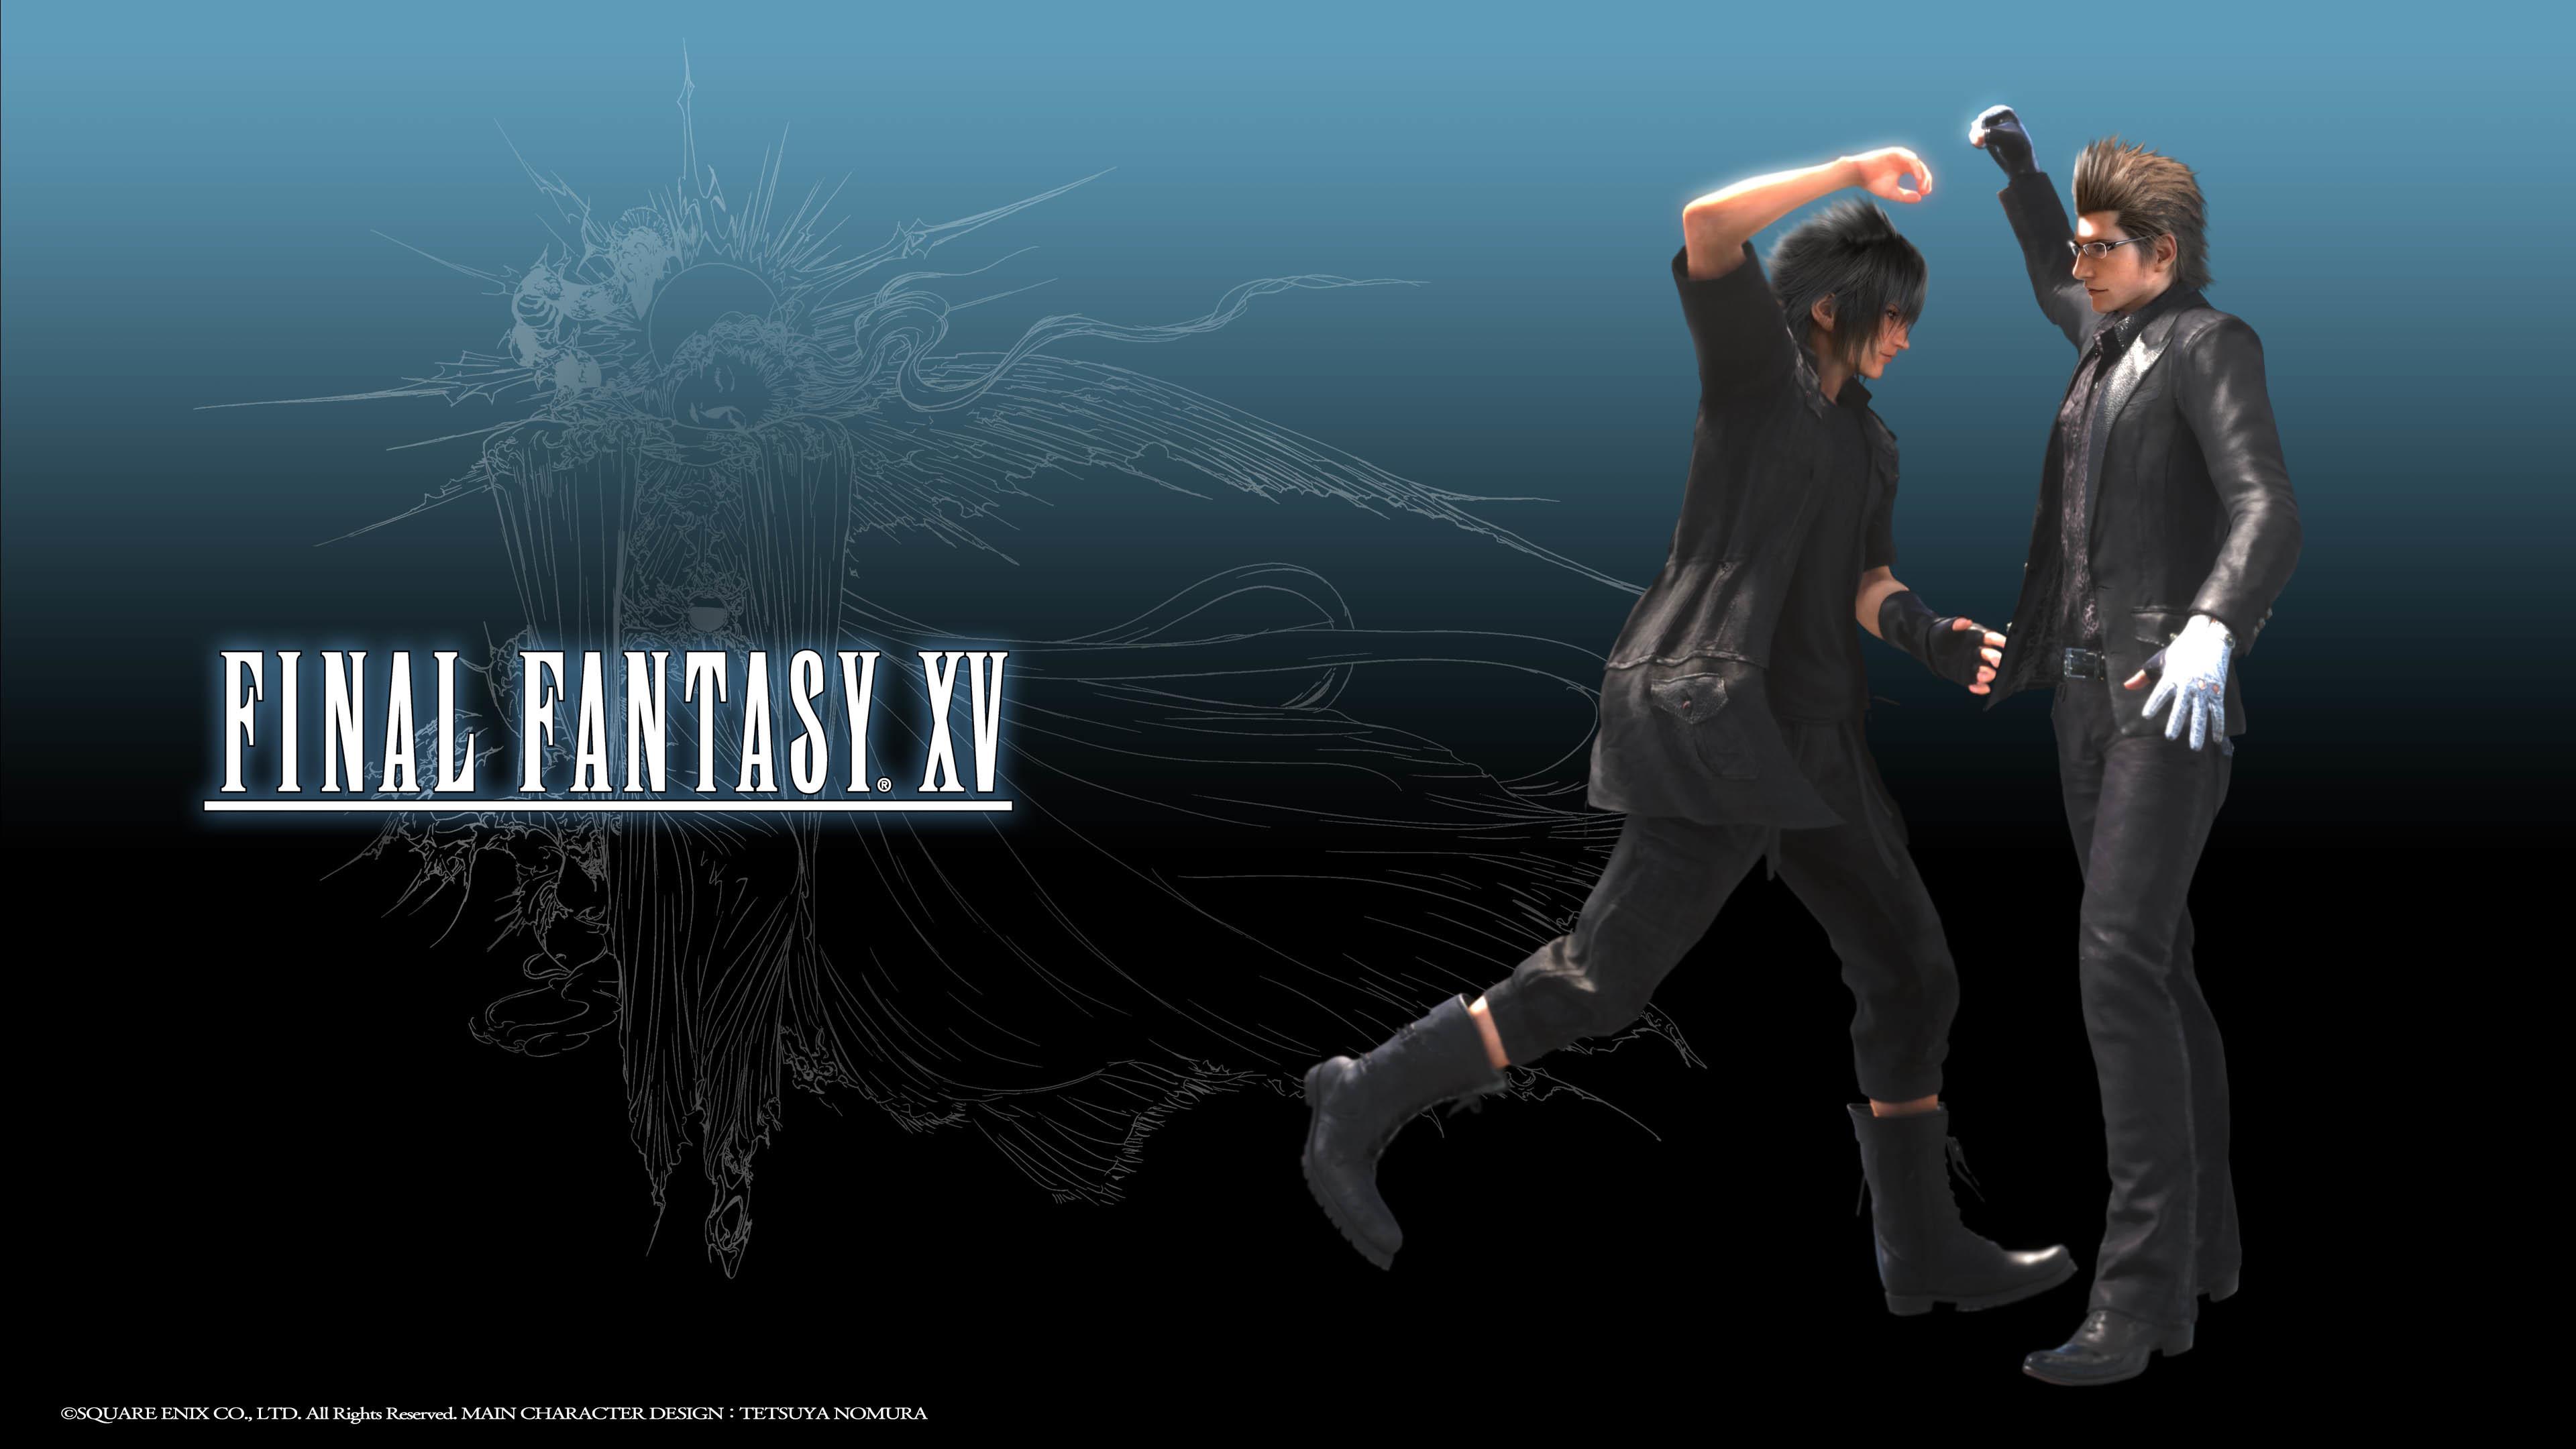 Noctis & Ignis – Final Fantasy XV wallpaper